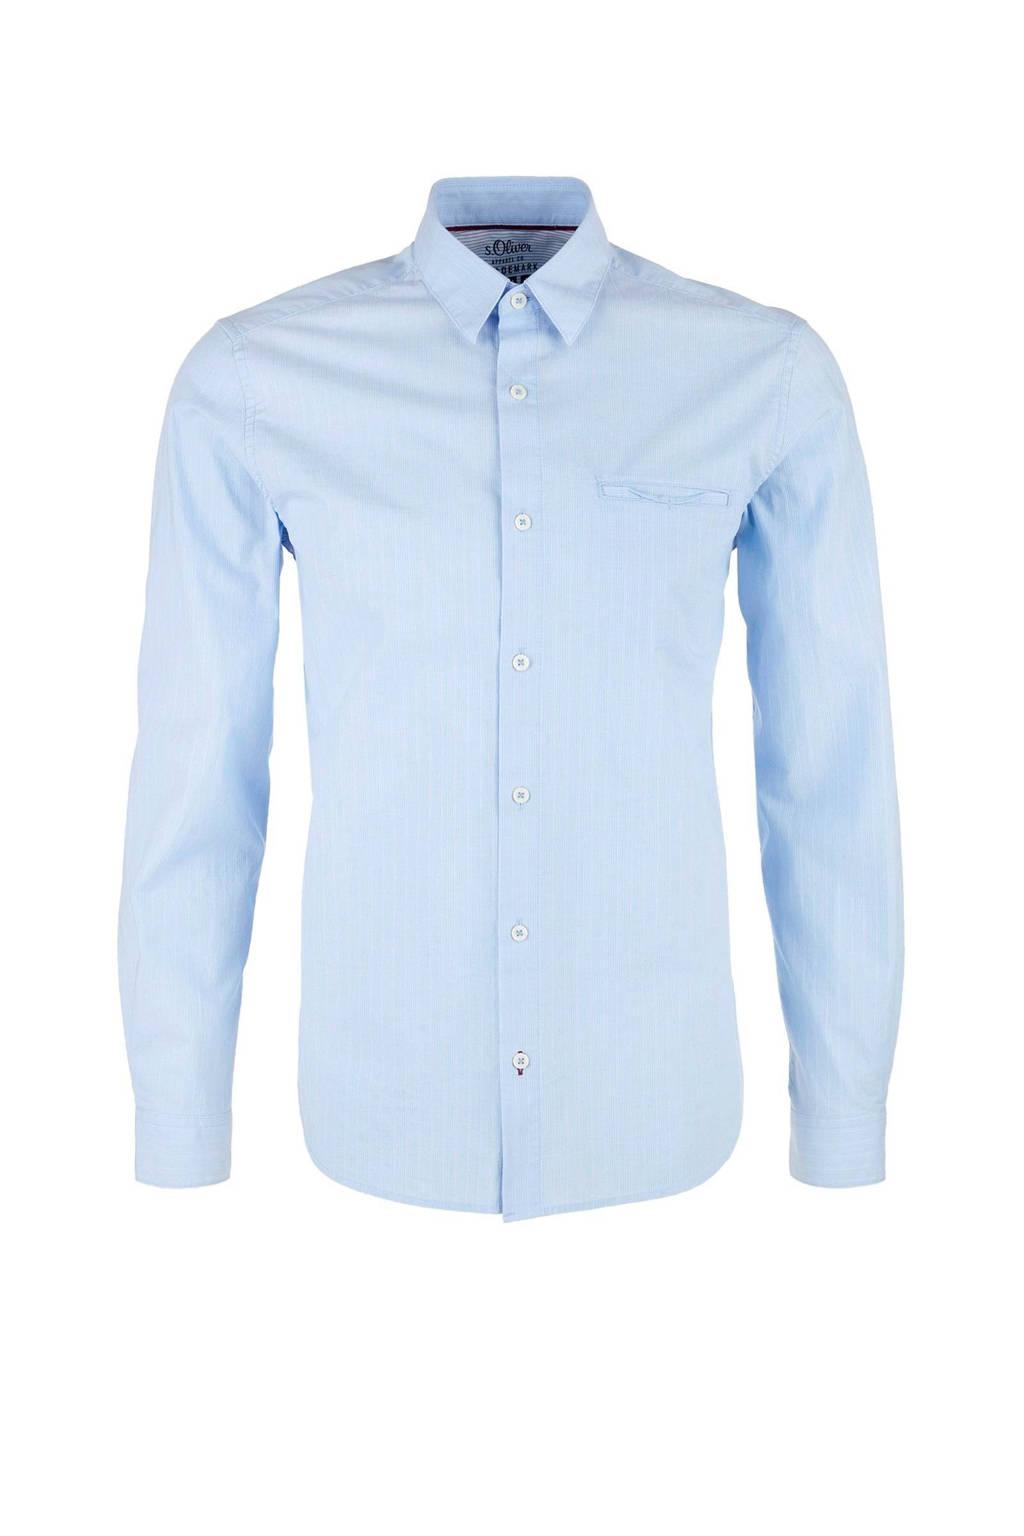 s.Oliver regular fit overhemd met krijtstreep lichtblauw, Lichtblauw